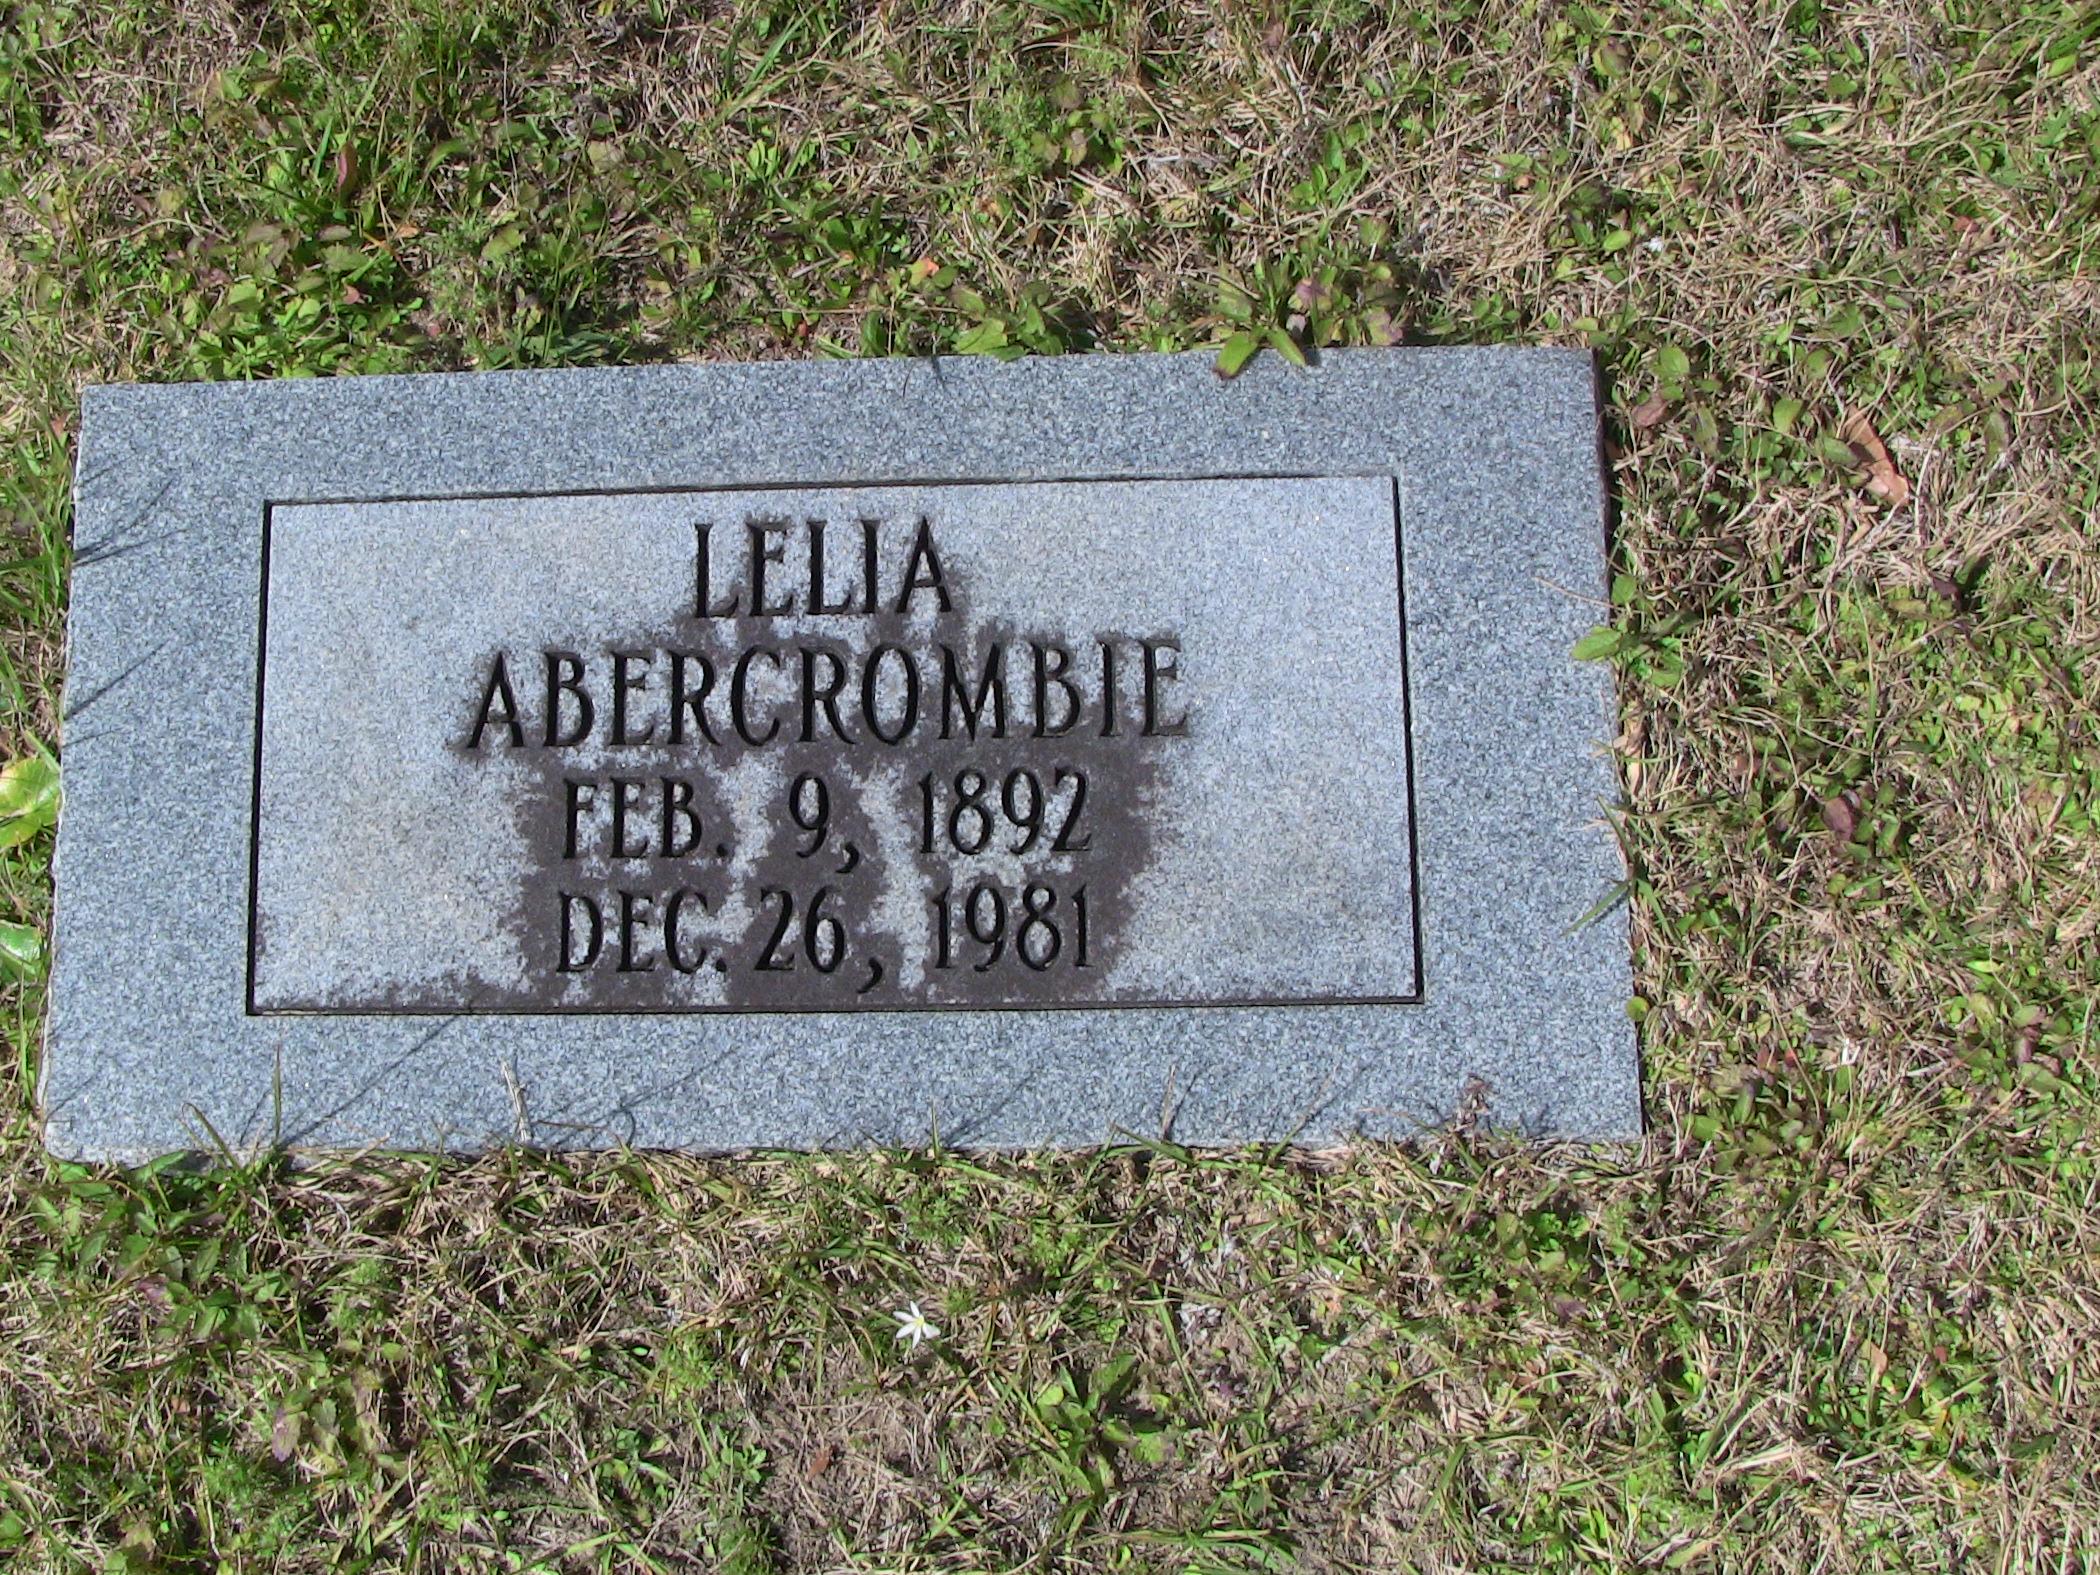 Lelia Abercrombie